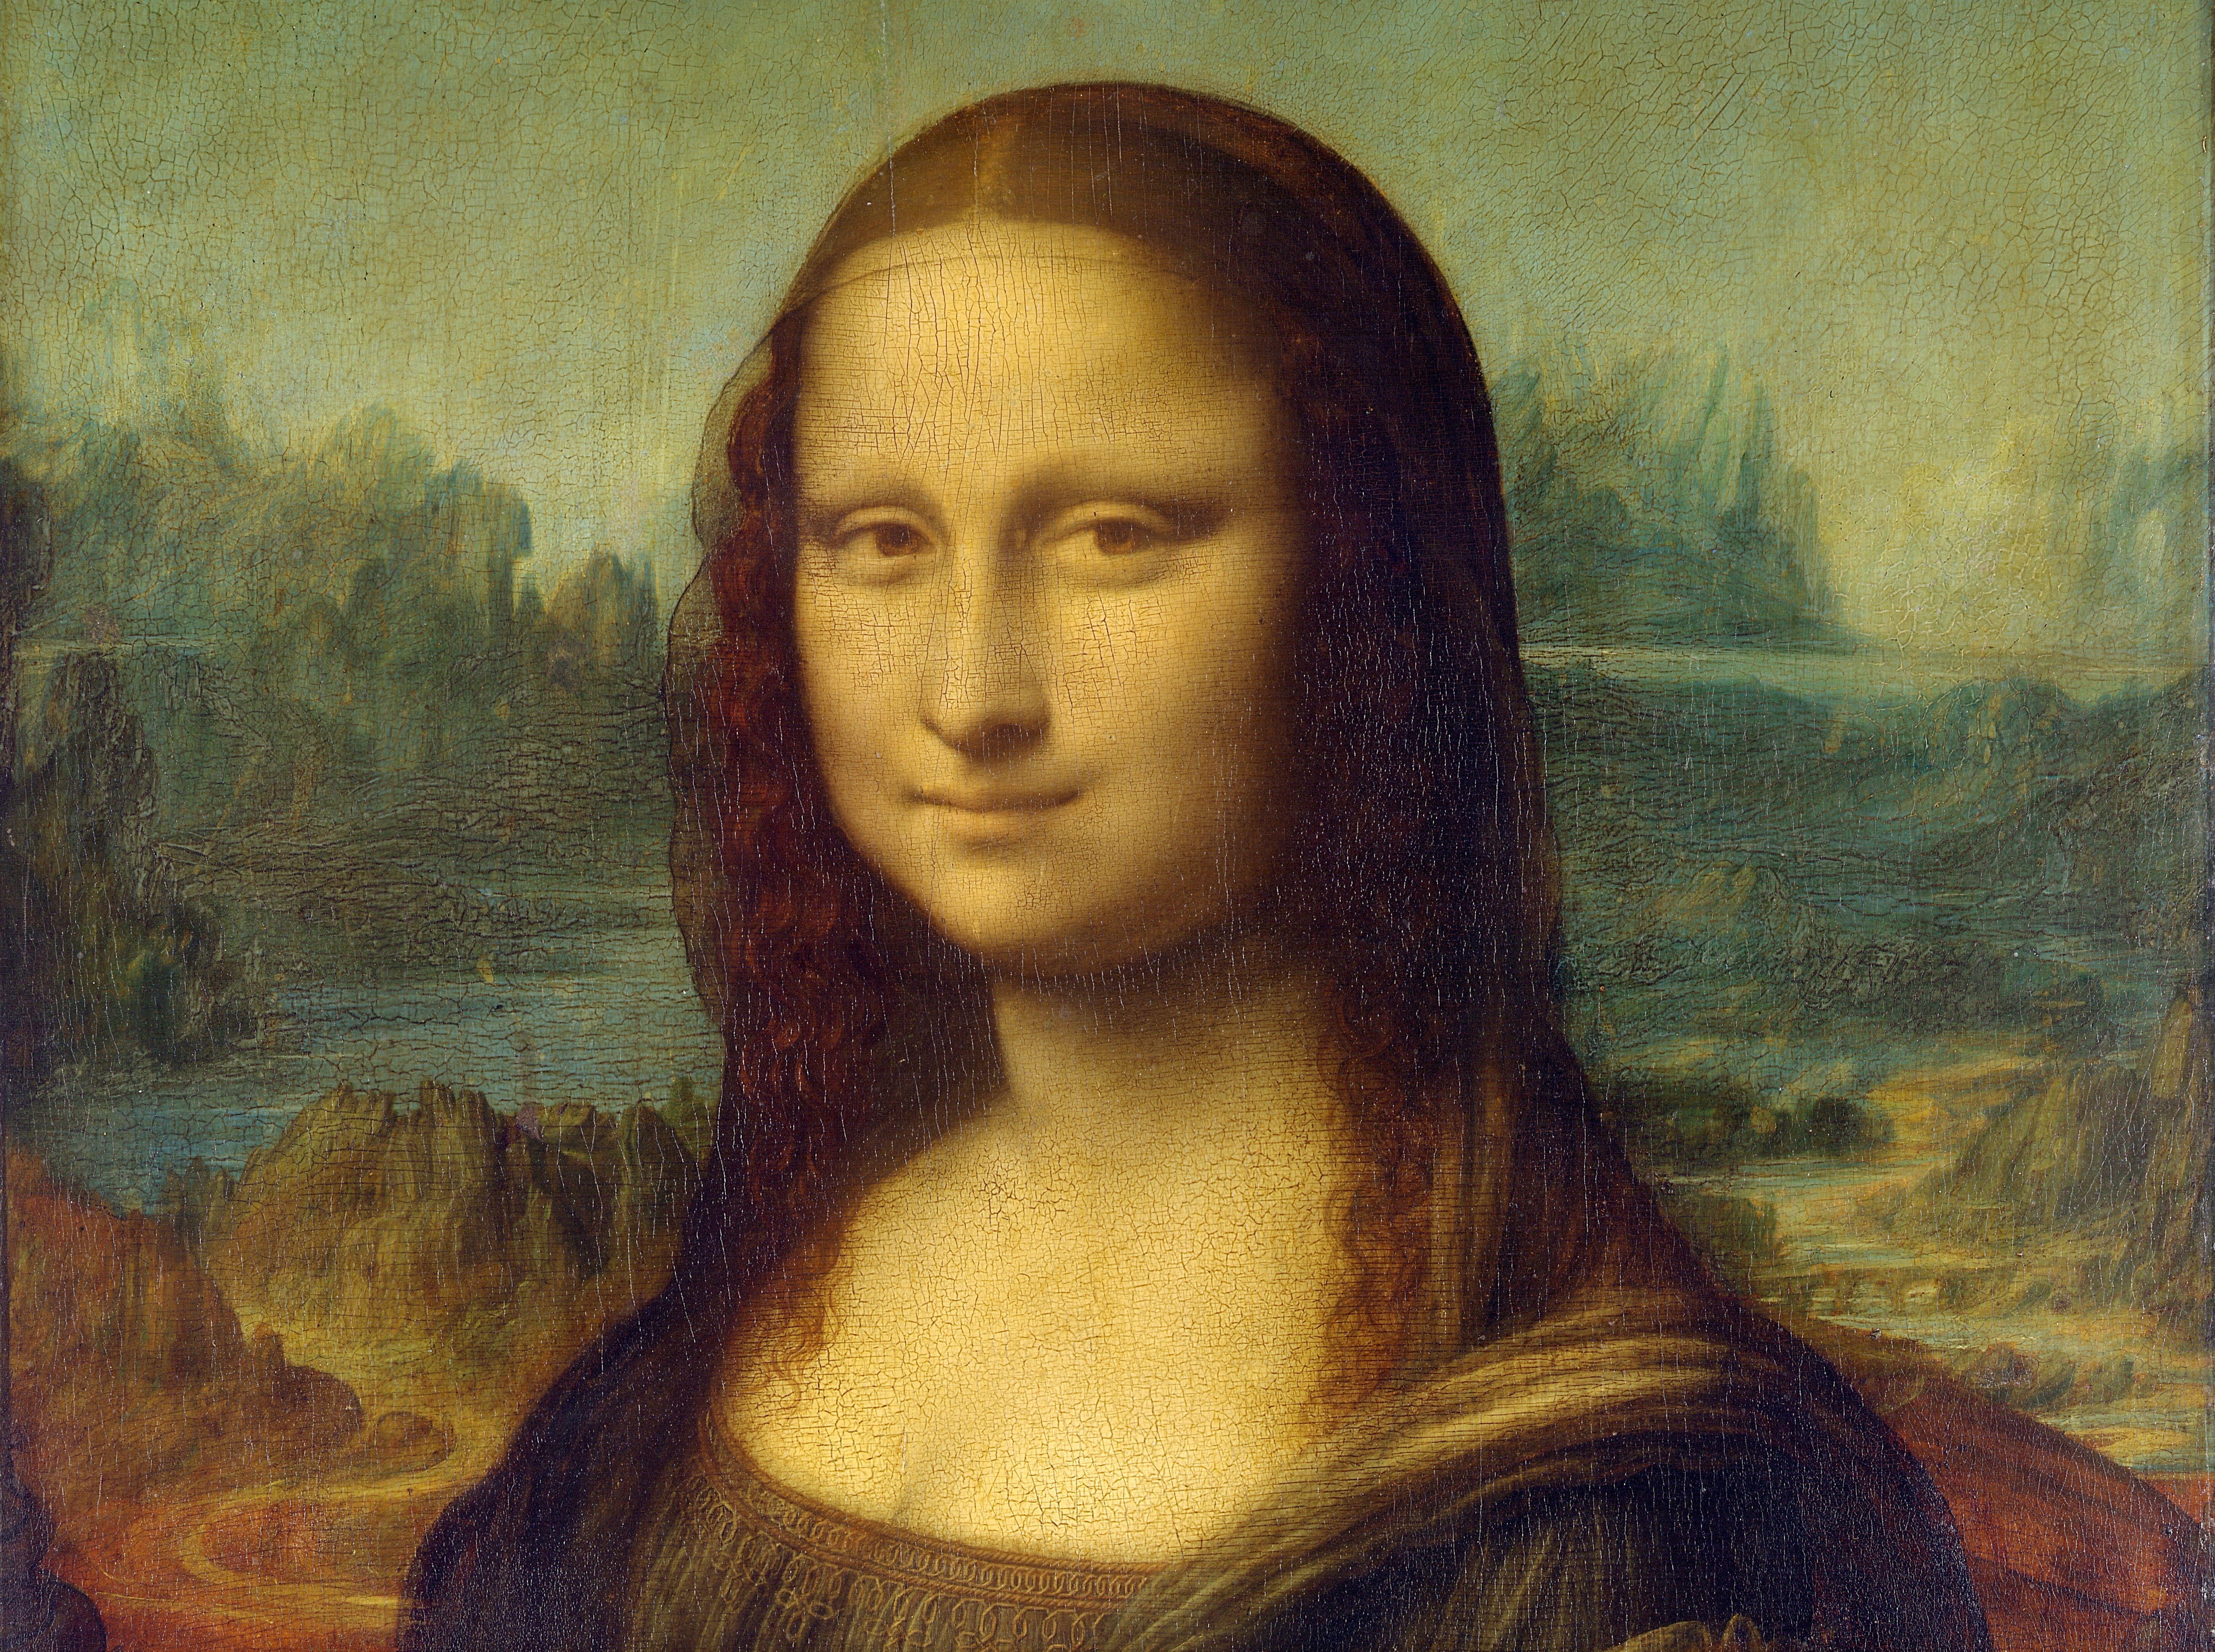 Mona Lisa By Leonardo Da Vinci Mona Lisa Painting Artistic Drawings Portrait Painting Monalisa Leonardodavinci Leonardo Da Vinci Mona Lisa Da Vinci Art